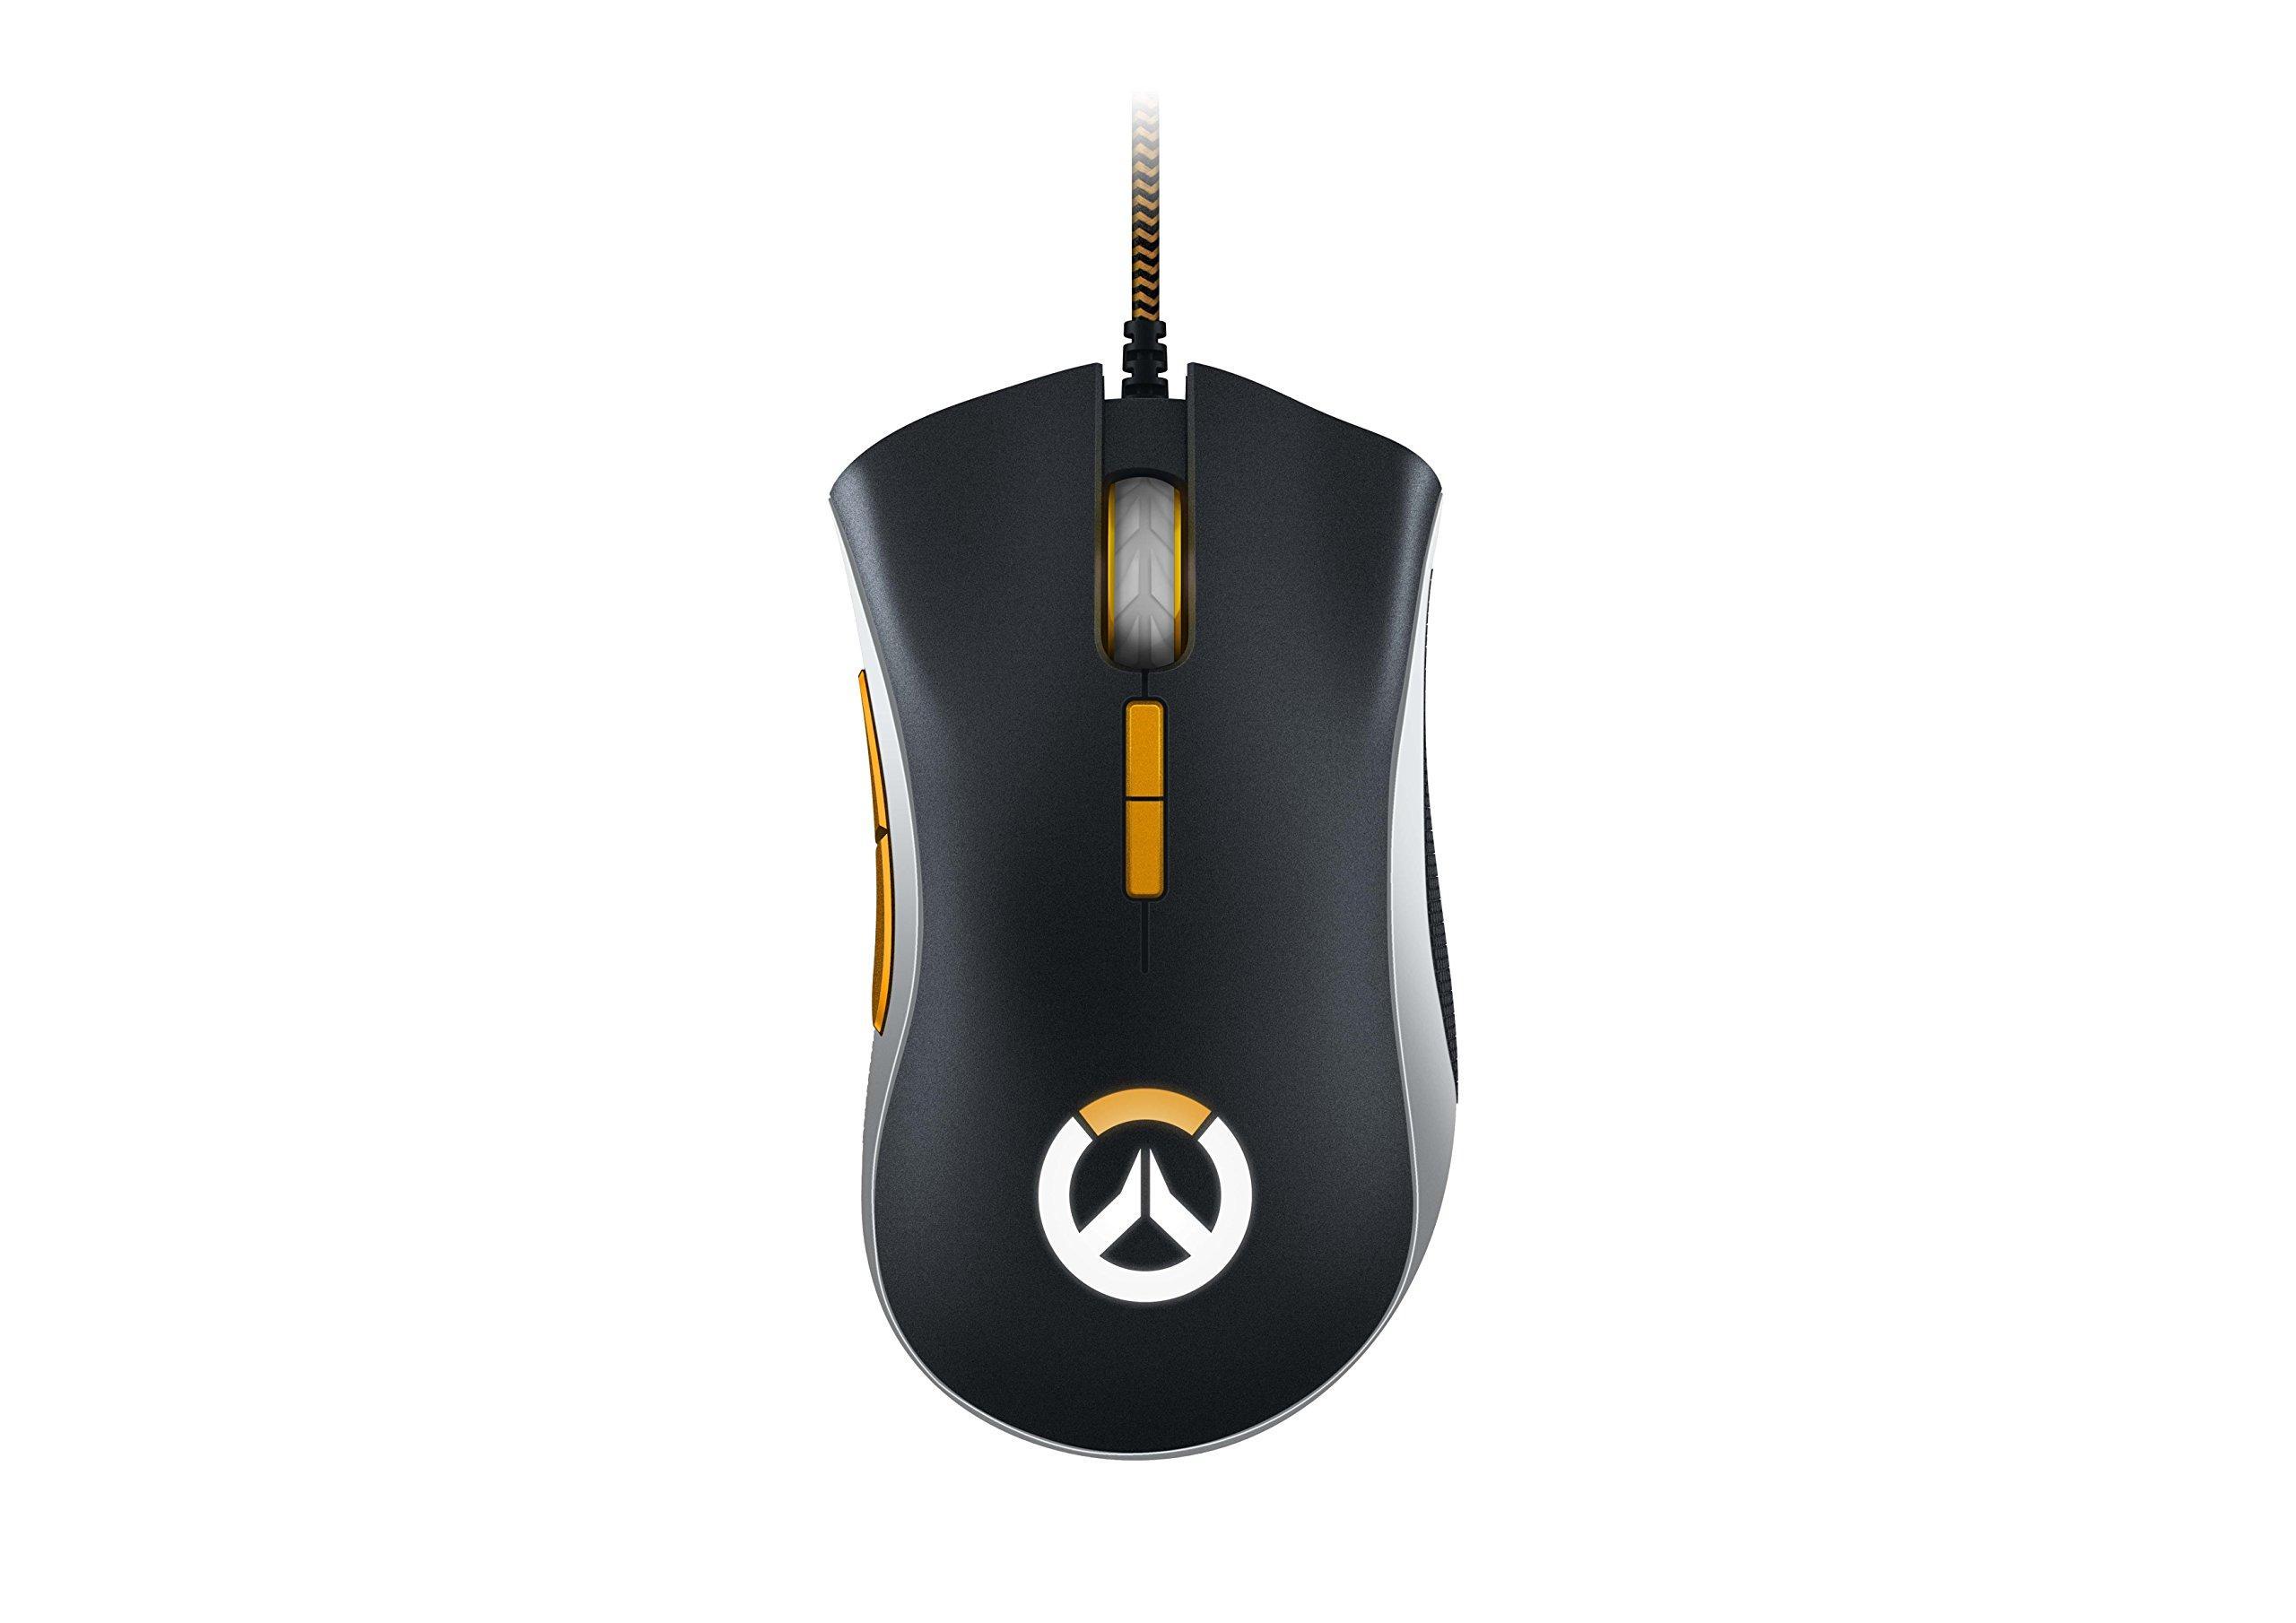 Razer DeathAdder Elite Overwatch Edition - Chroma Enabled RGB Ergonomic Gaming Mouse